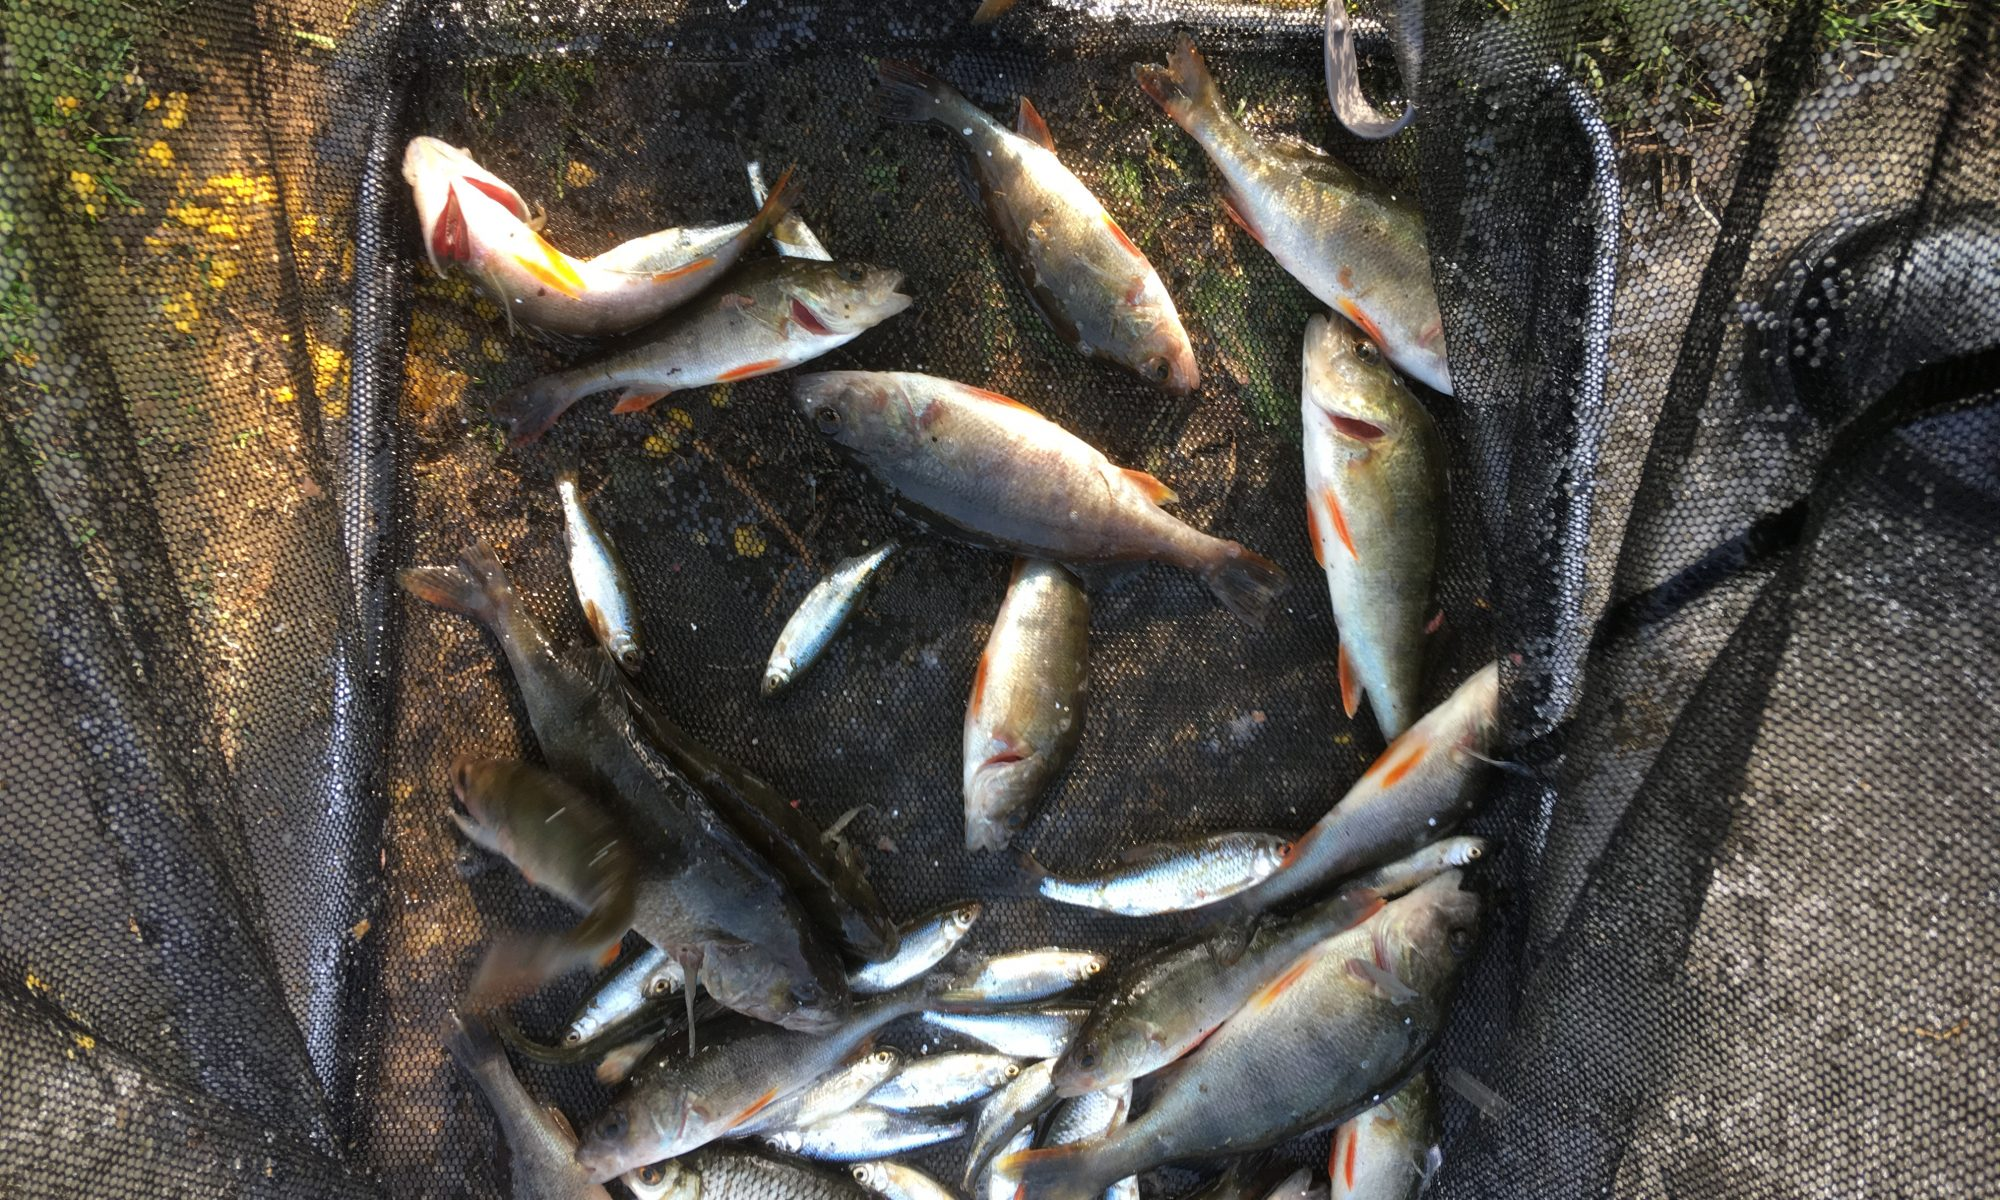 Mixed net of roach & perch caught from Wyver Lane Pond, Belper